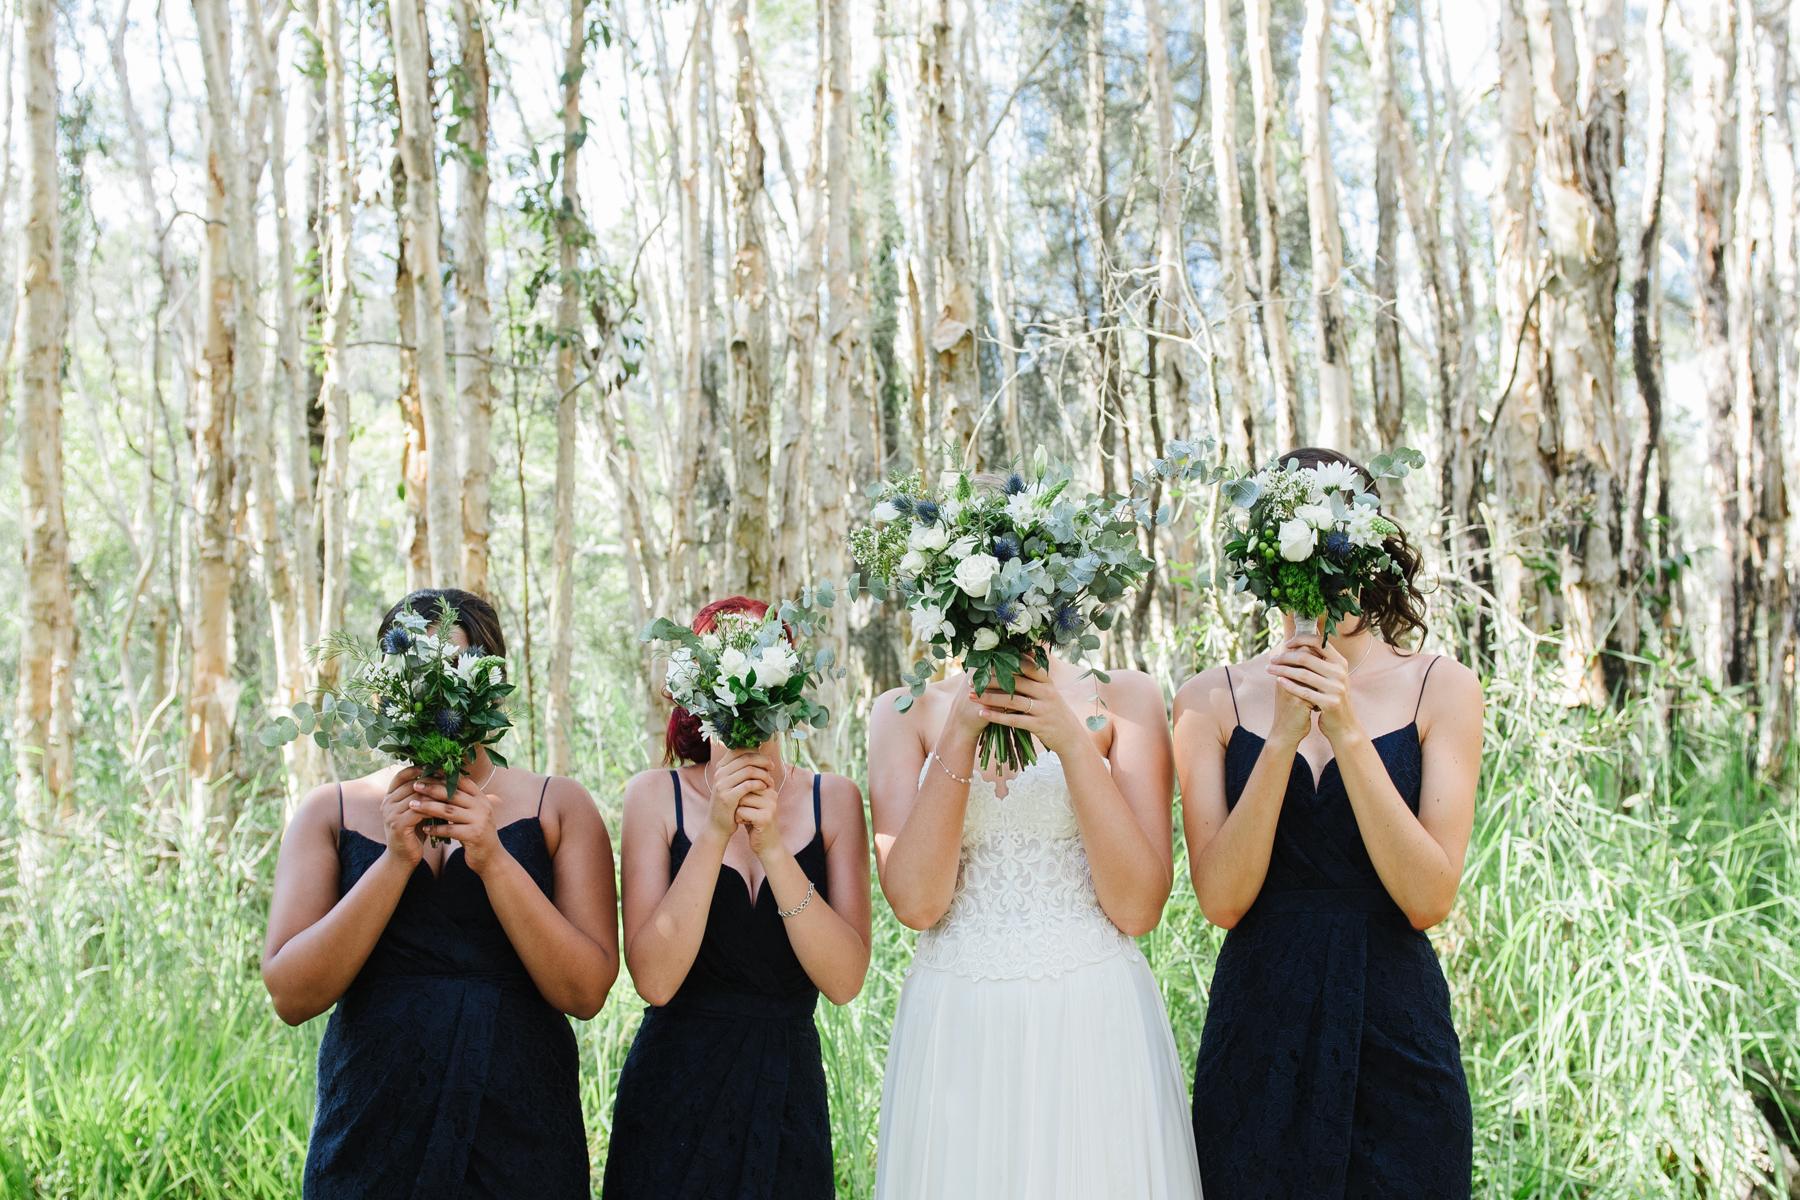 Cass and Josh- wedding photographer, byron bay wedding and family photographer, tweed heads wedding and family photography-544.jpg